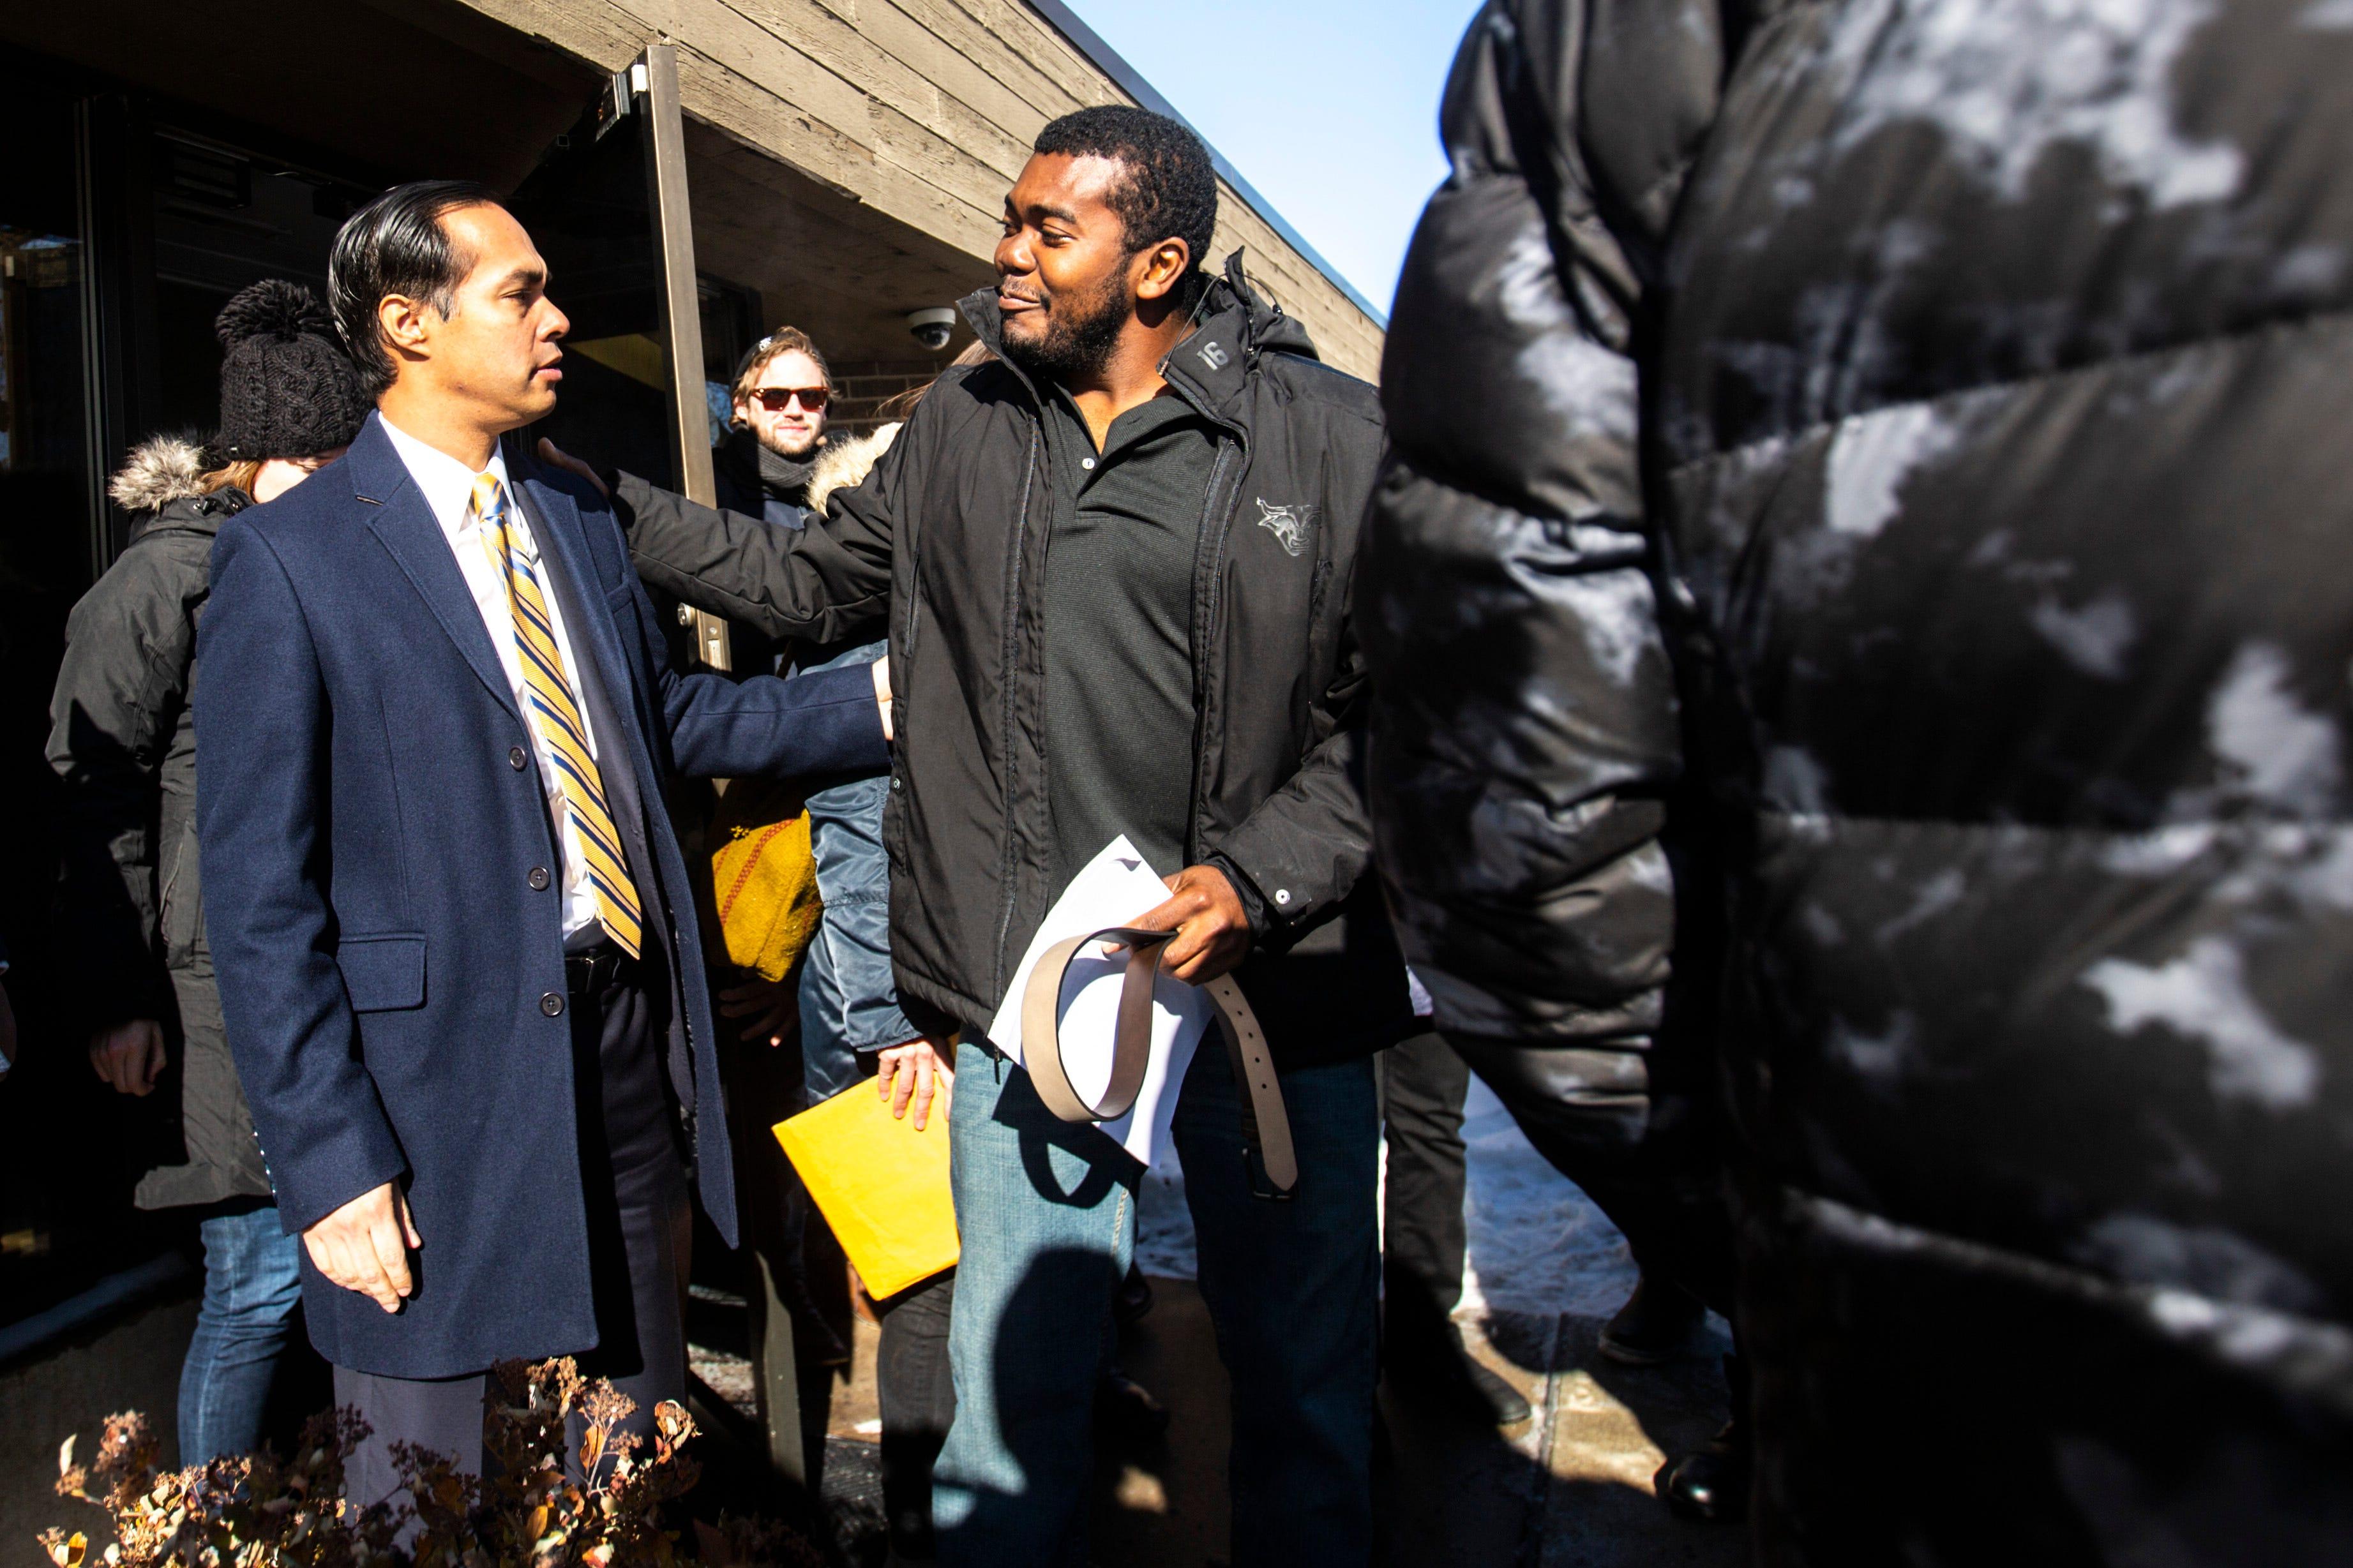 Photos: Julián Castro attends ICE visit with refugee in Iowa